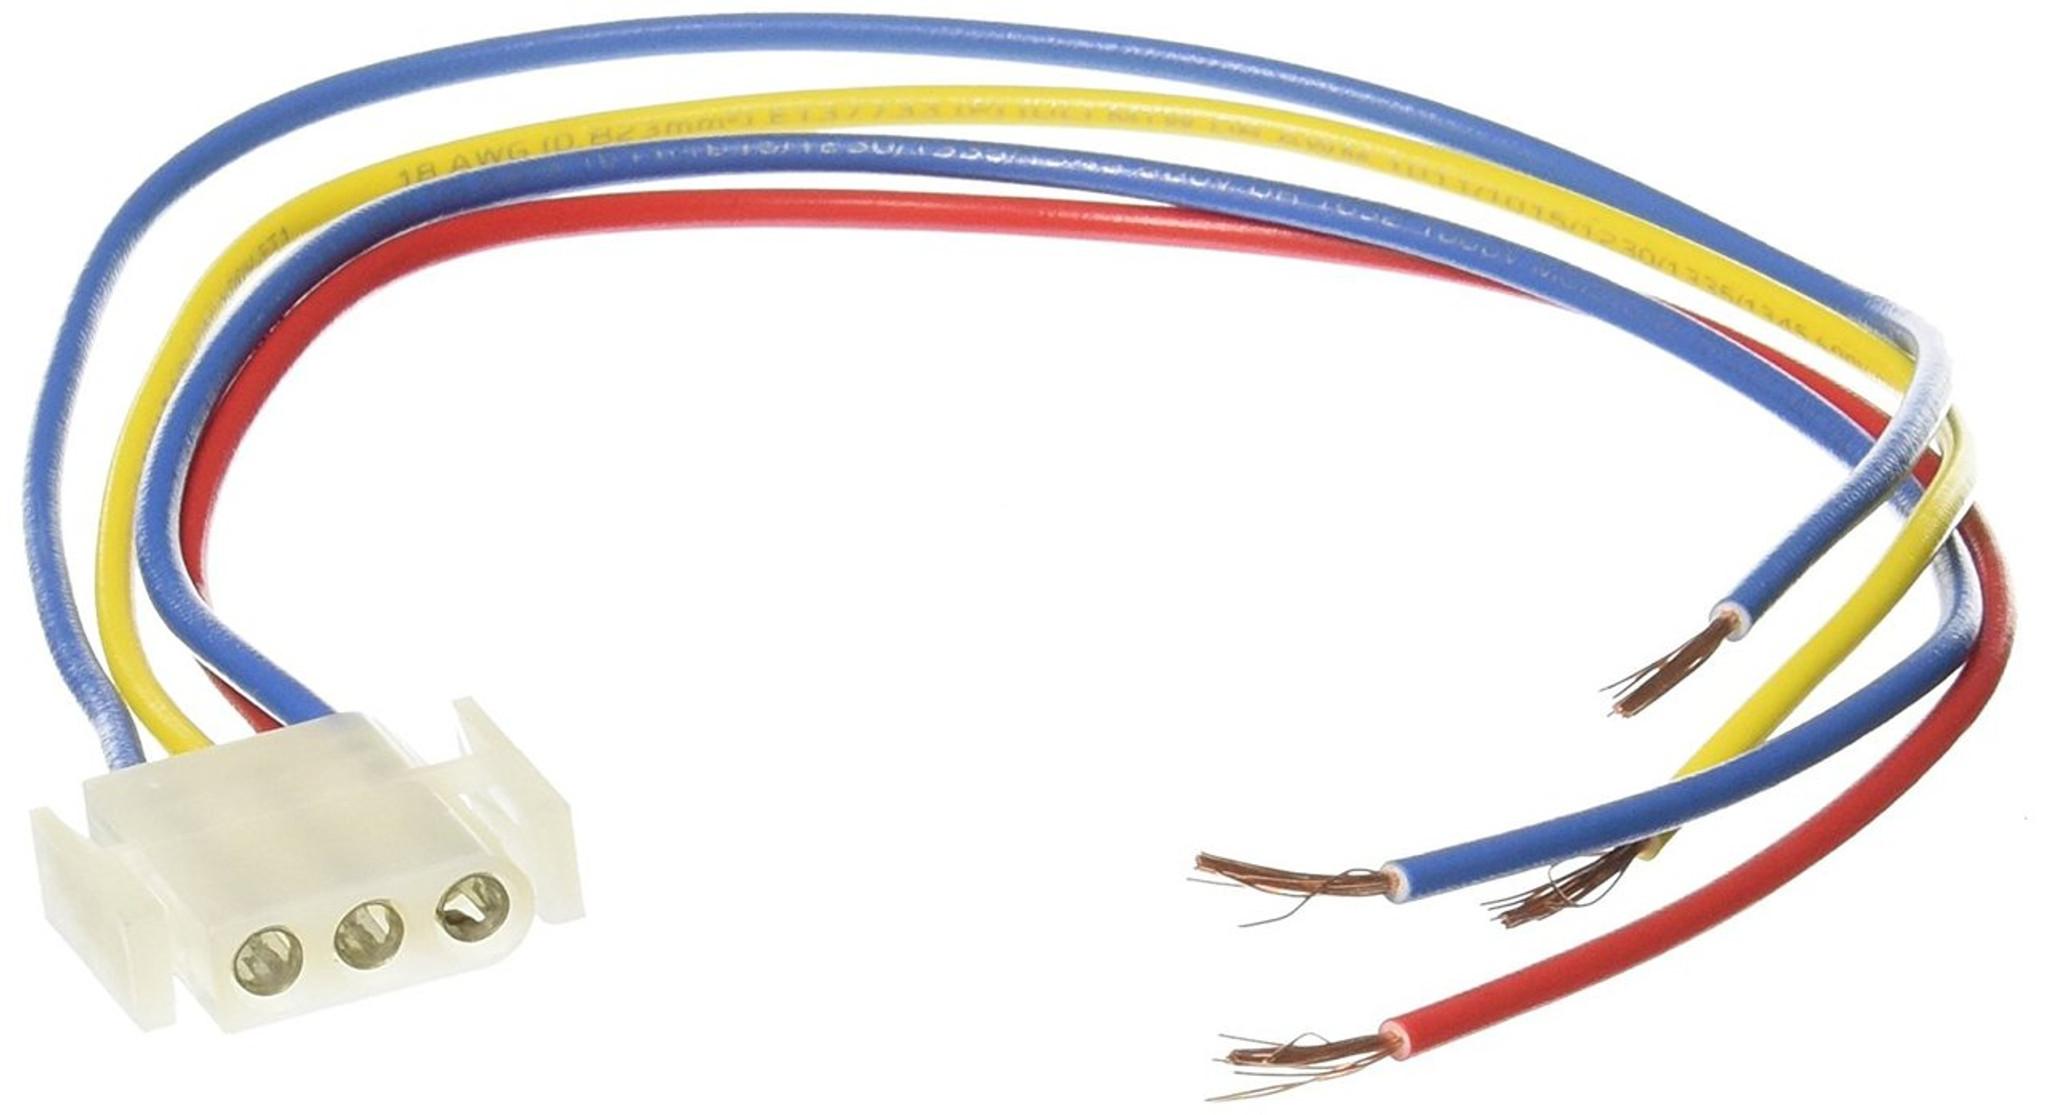 suburban furnace power supply wire harness 520322 3 pin female suburban rv furnace wiring harness [ 2048 x 1115 Pixel ]